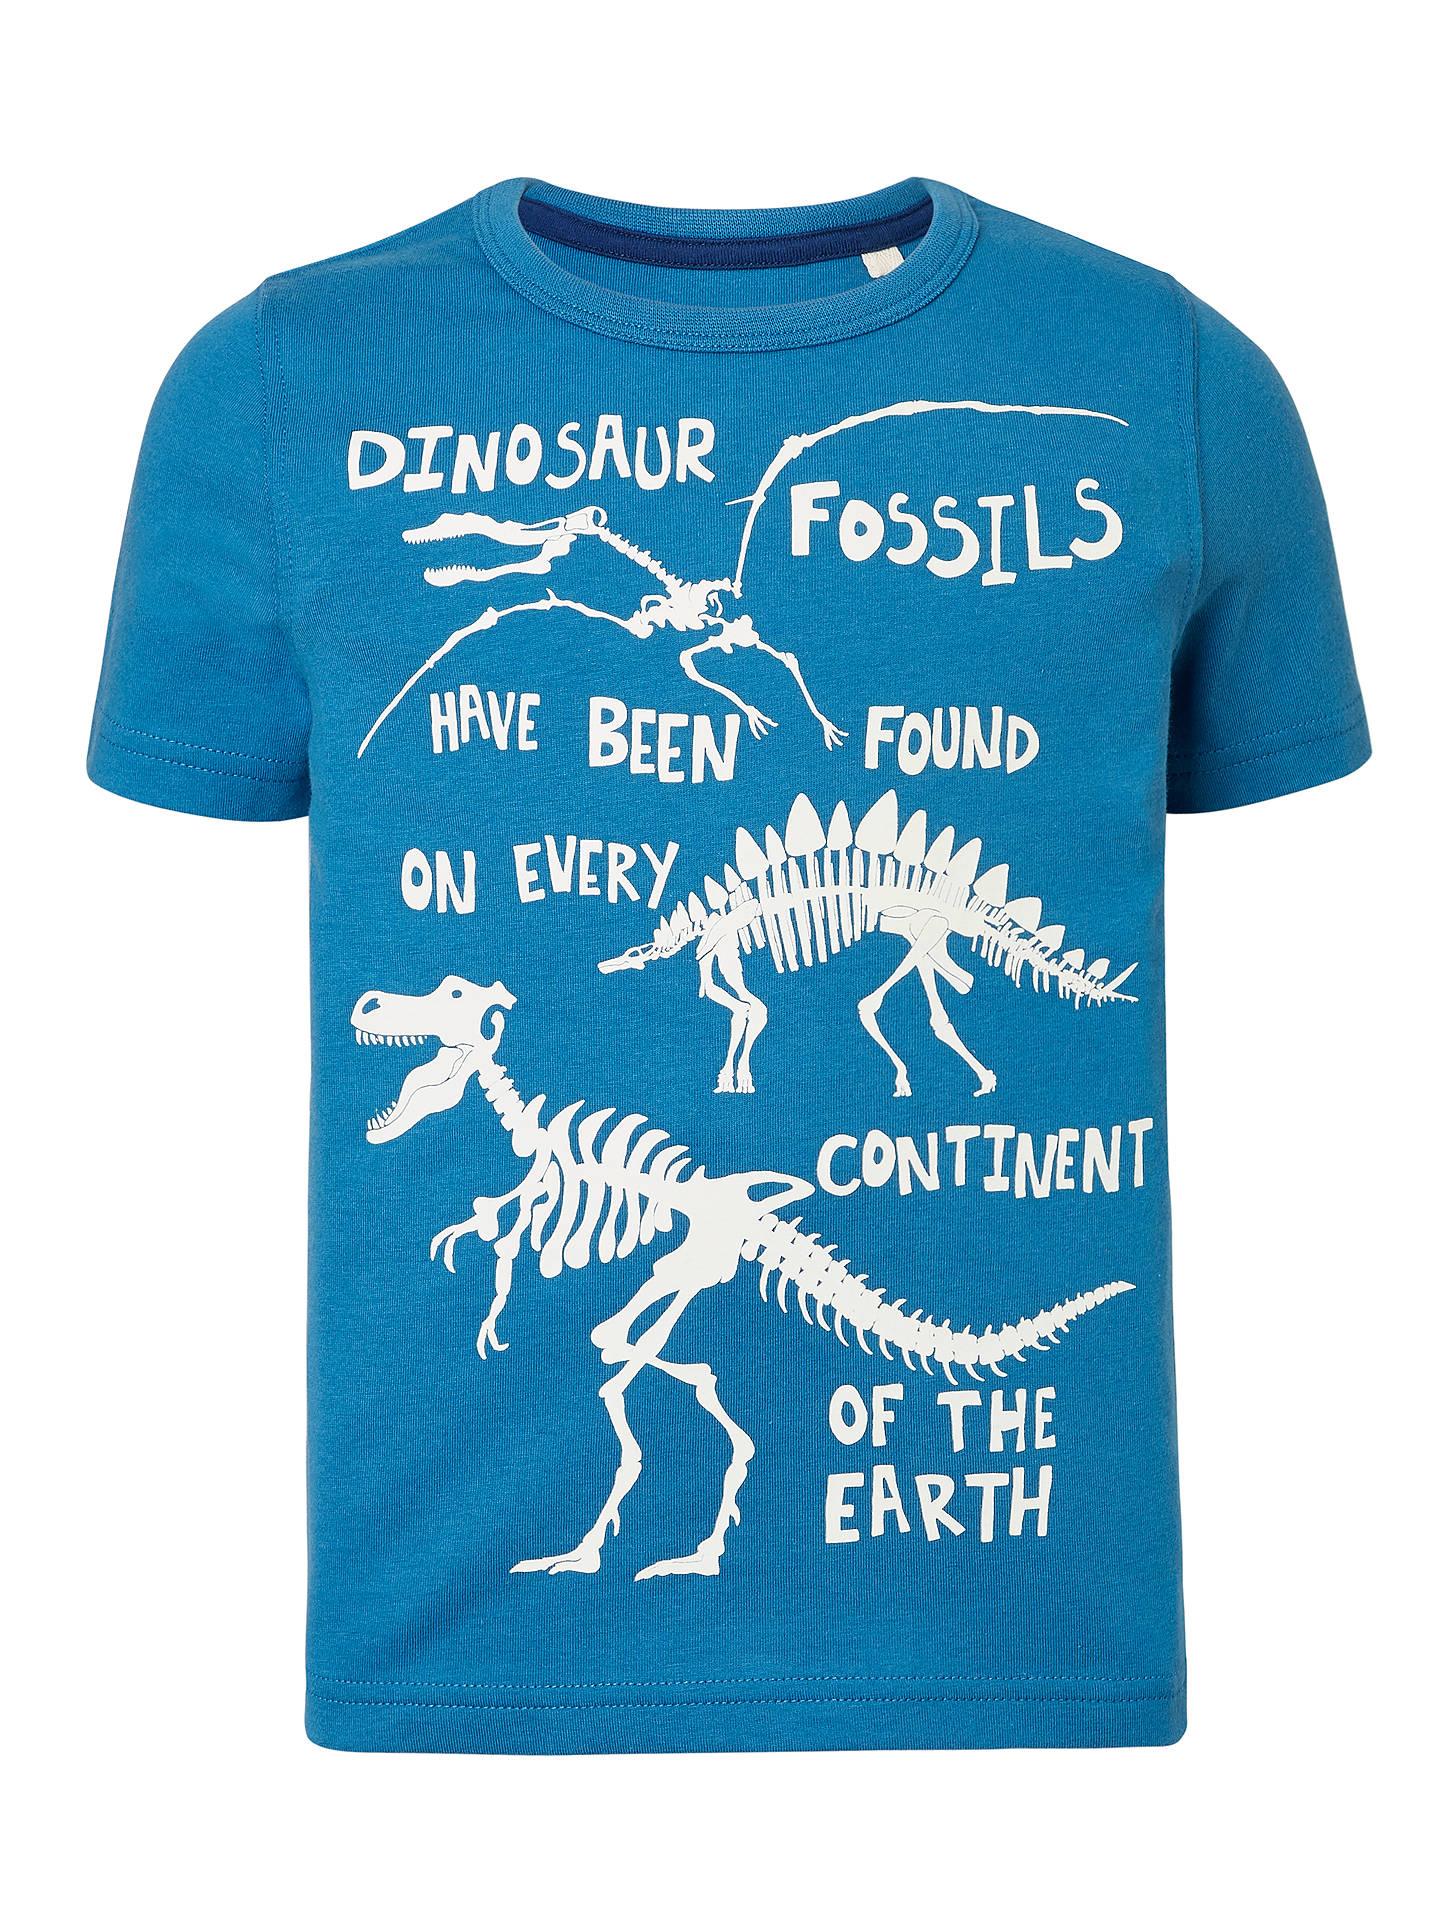 0f23efdf John Lewis & Partners Boys' Glow In The Dark Dinosaur T-Shirt, Blue ...